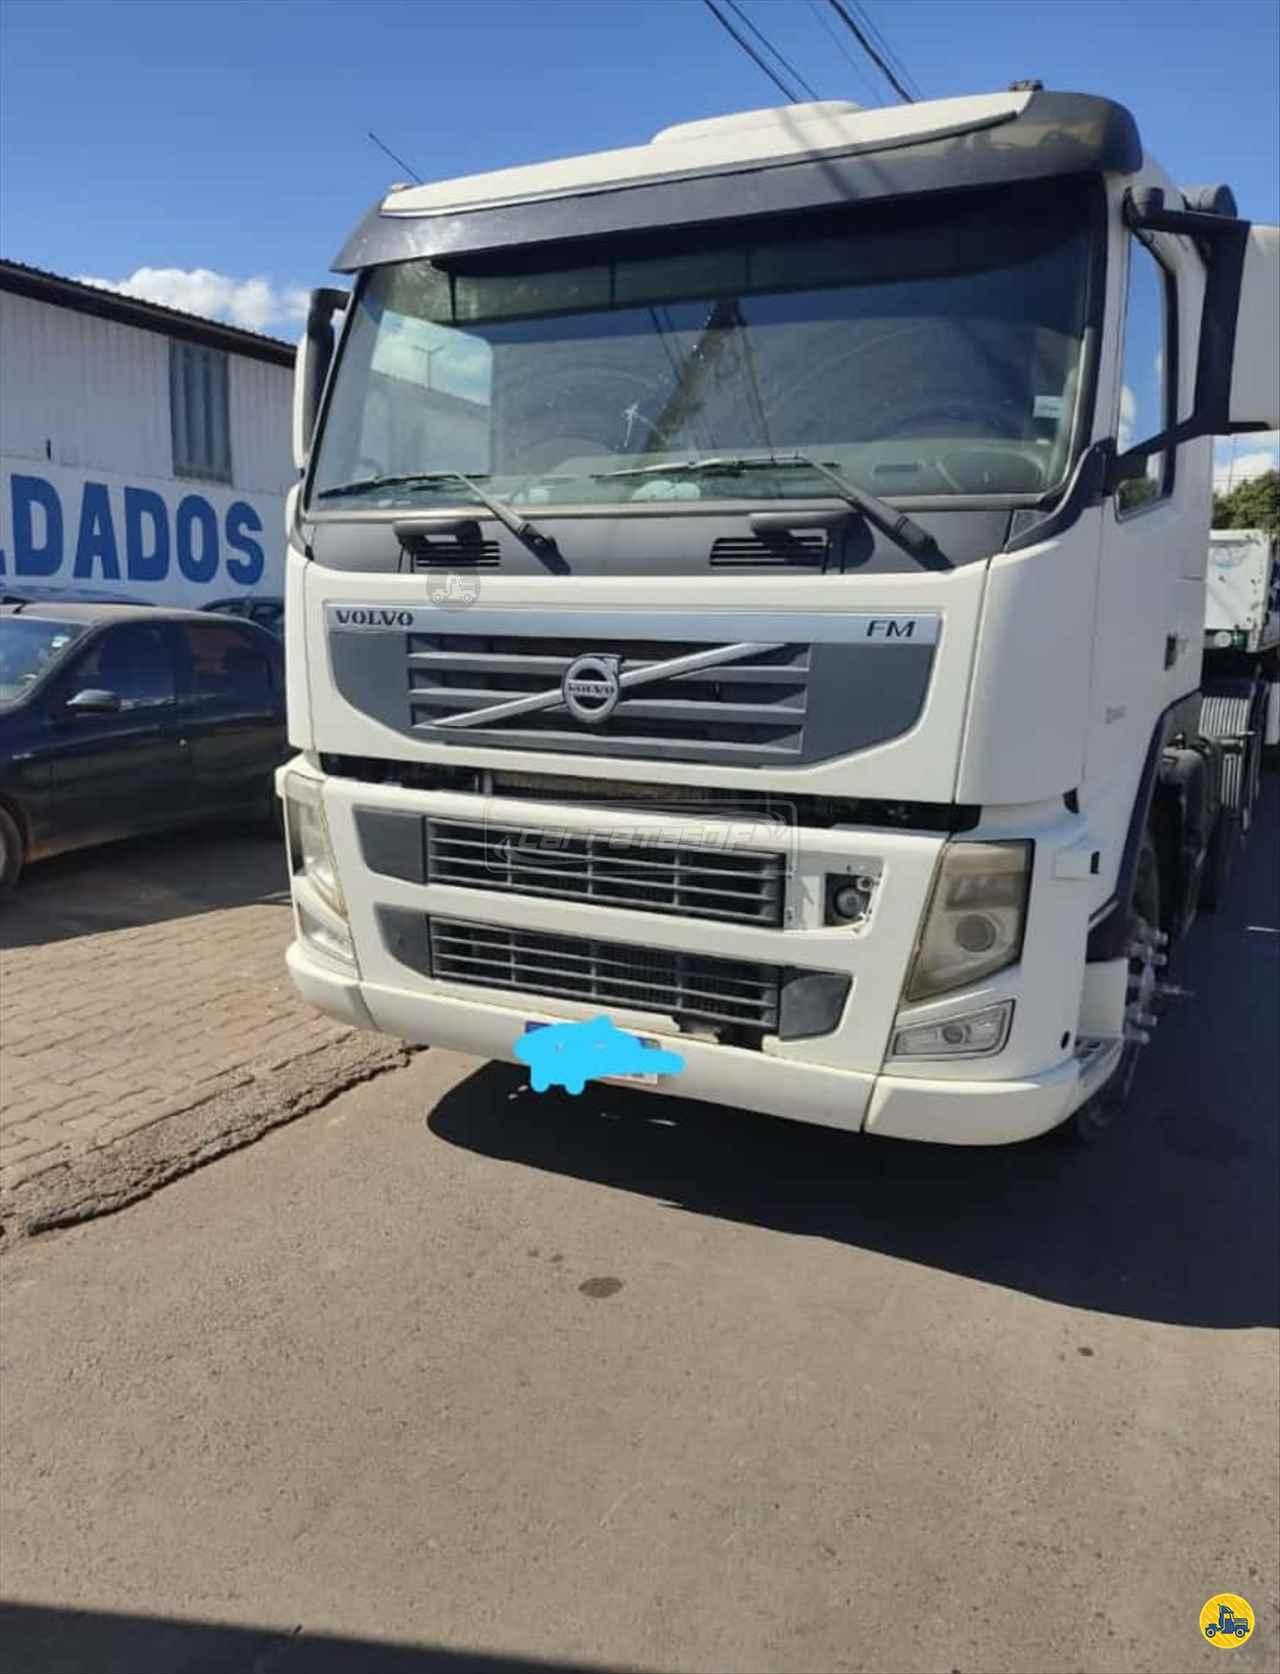 CAMINHAO VOLVO VOLVO FM 370 Cavalo Mecânico Truck 6x2 CARRETAS DF - NOMA BRASILIA DISTRITO FEDERAL DF